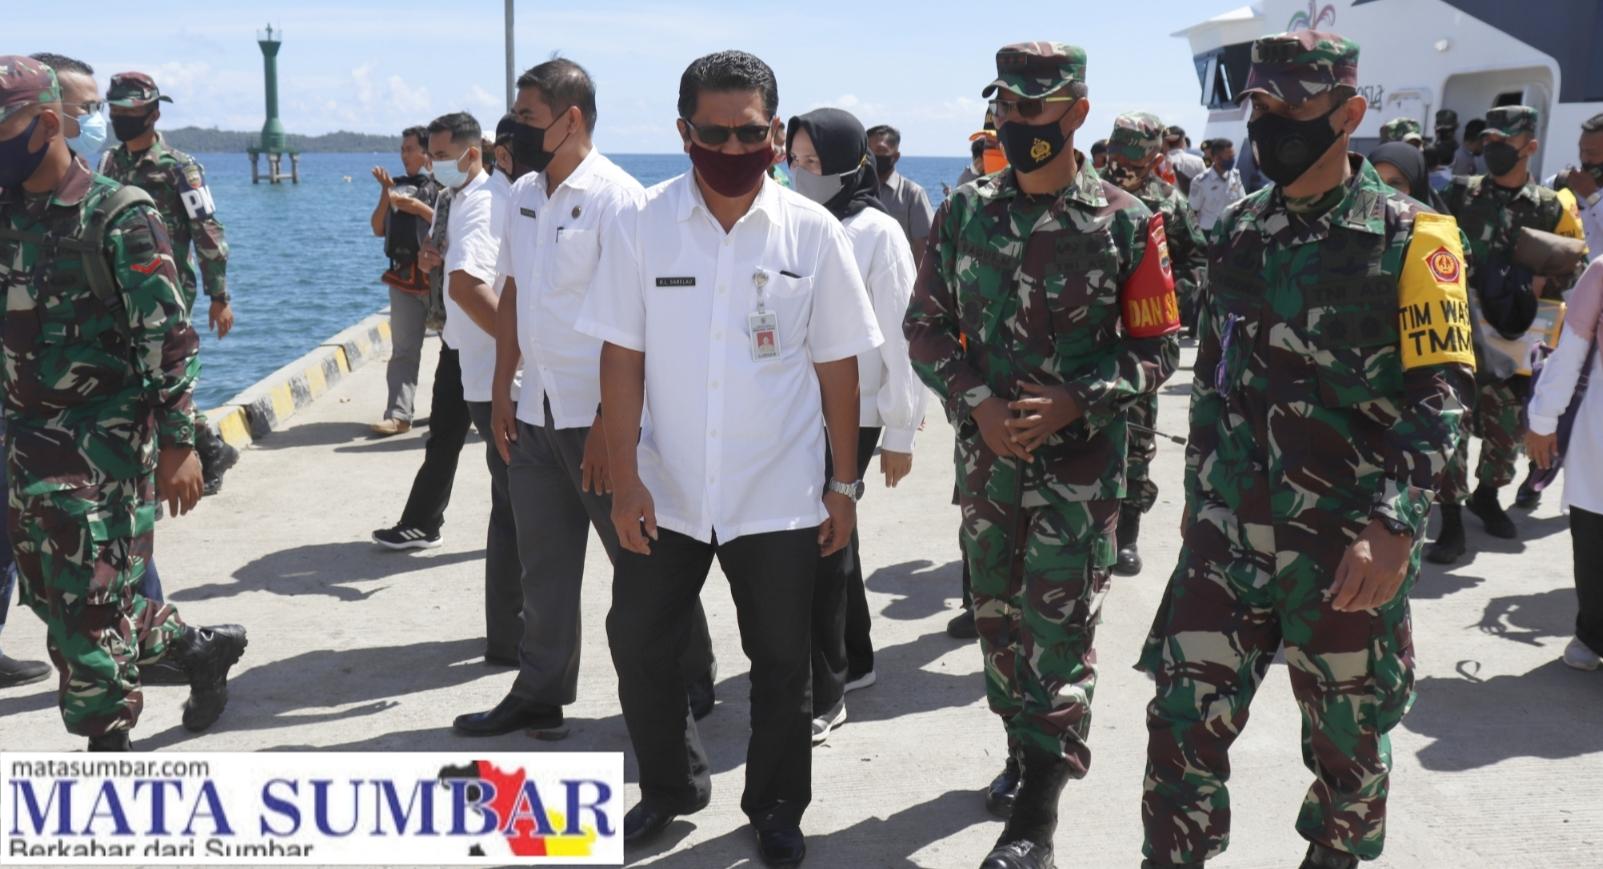 Tinjau Kegiatan TMMD Ke-110, Tim Wasev Kunjungi Mentawai